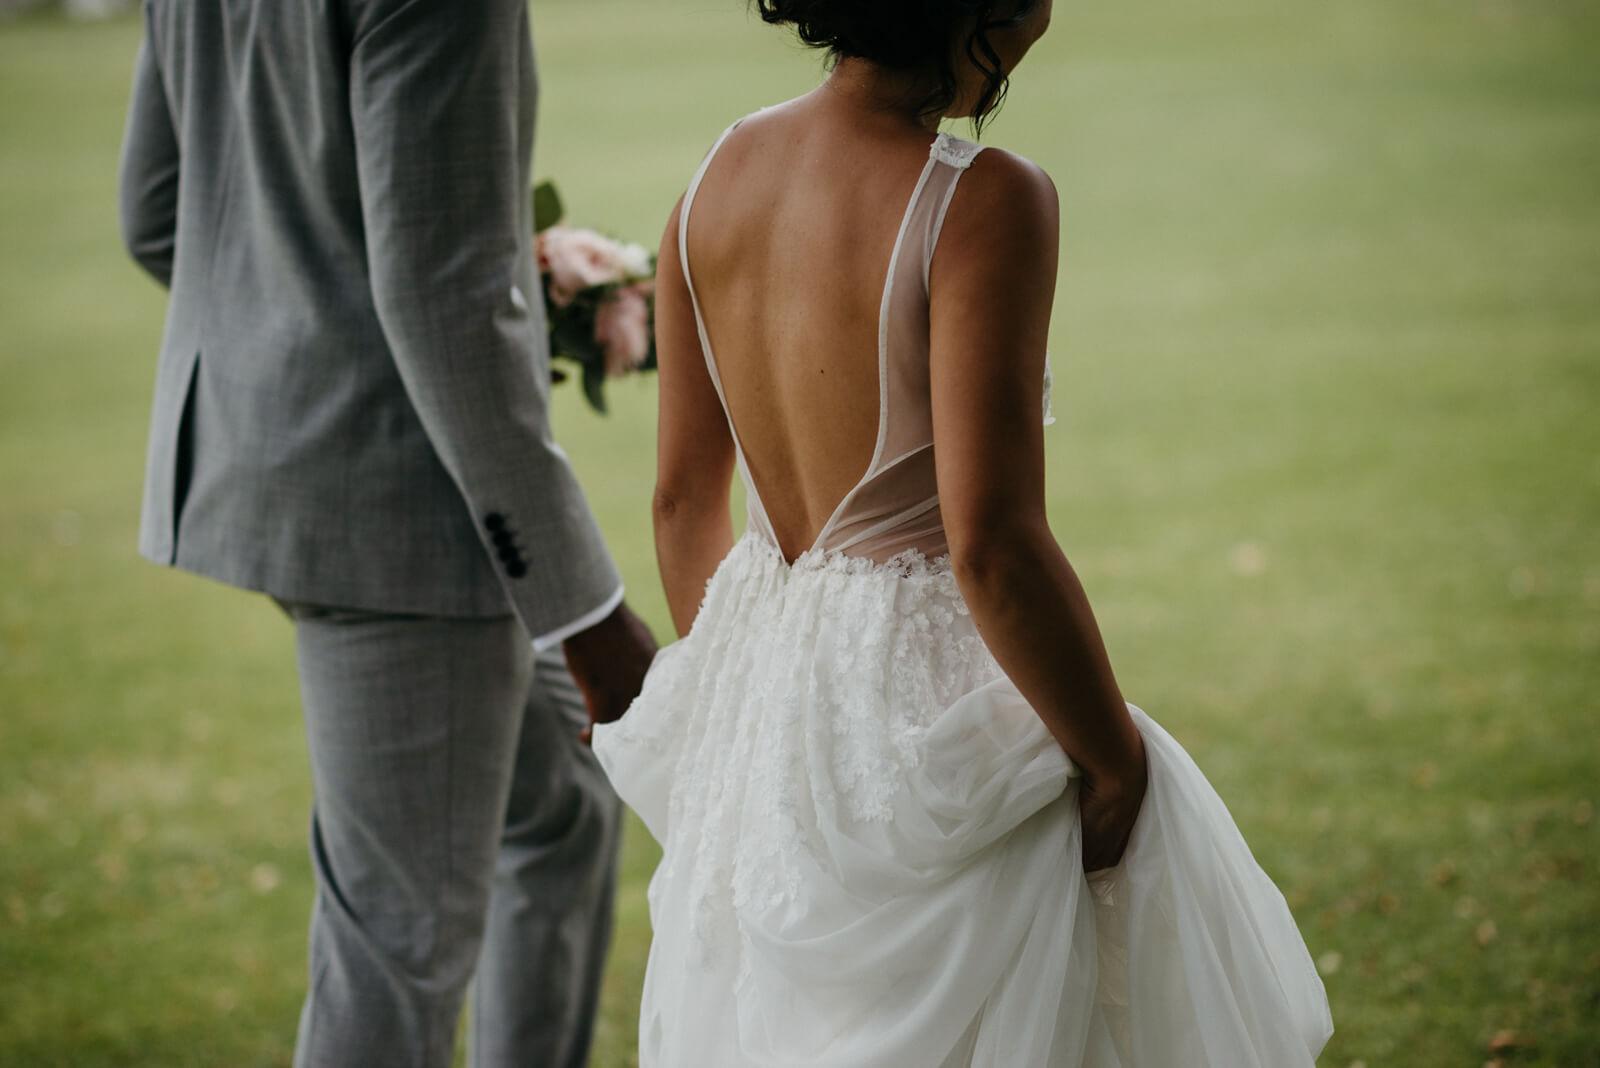 London bride & groom strolling through the park next to Belair House